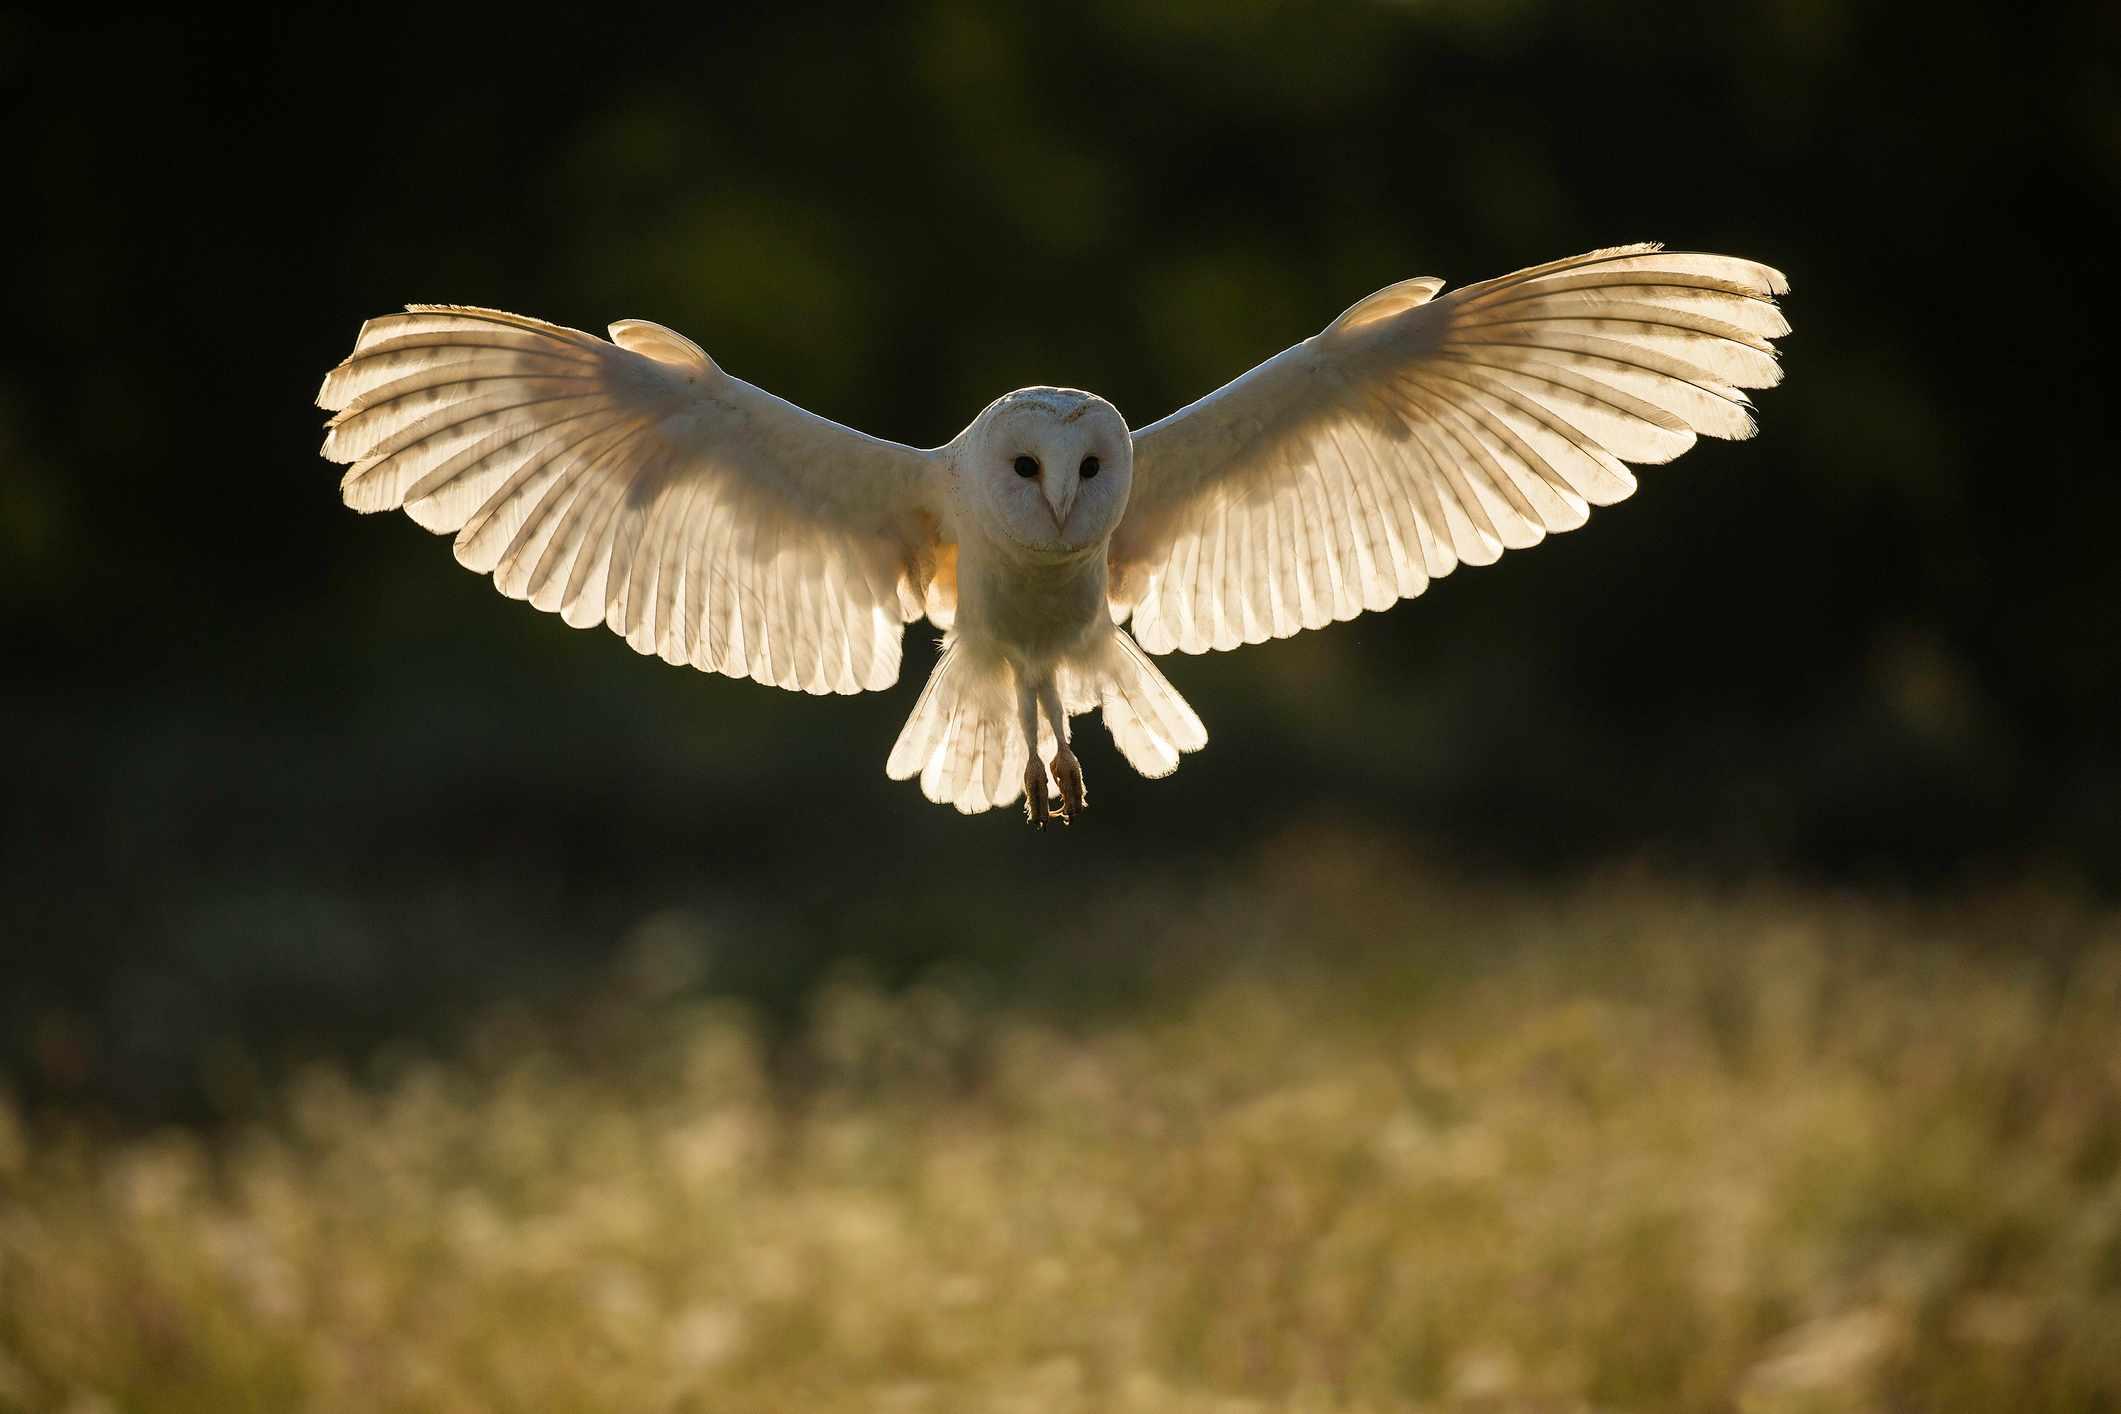 Barn owl (Tyto alba) in flight at sunset